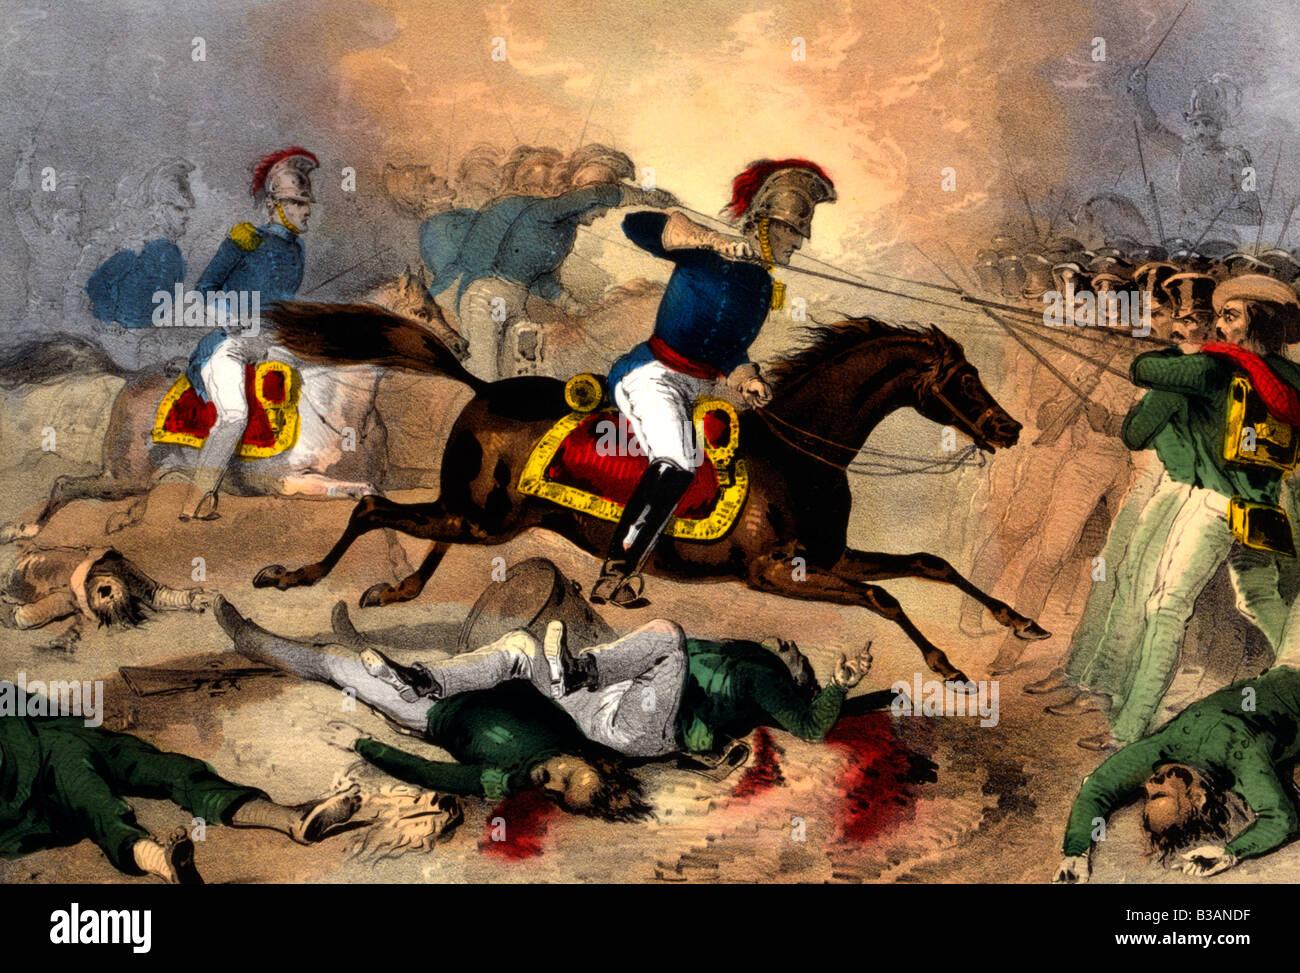 Brillenstärke Berechnen : mexican american war 1846 stockfotos mexican american ~ Themetempest.com Abrechnung